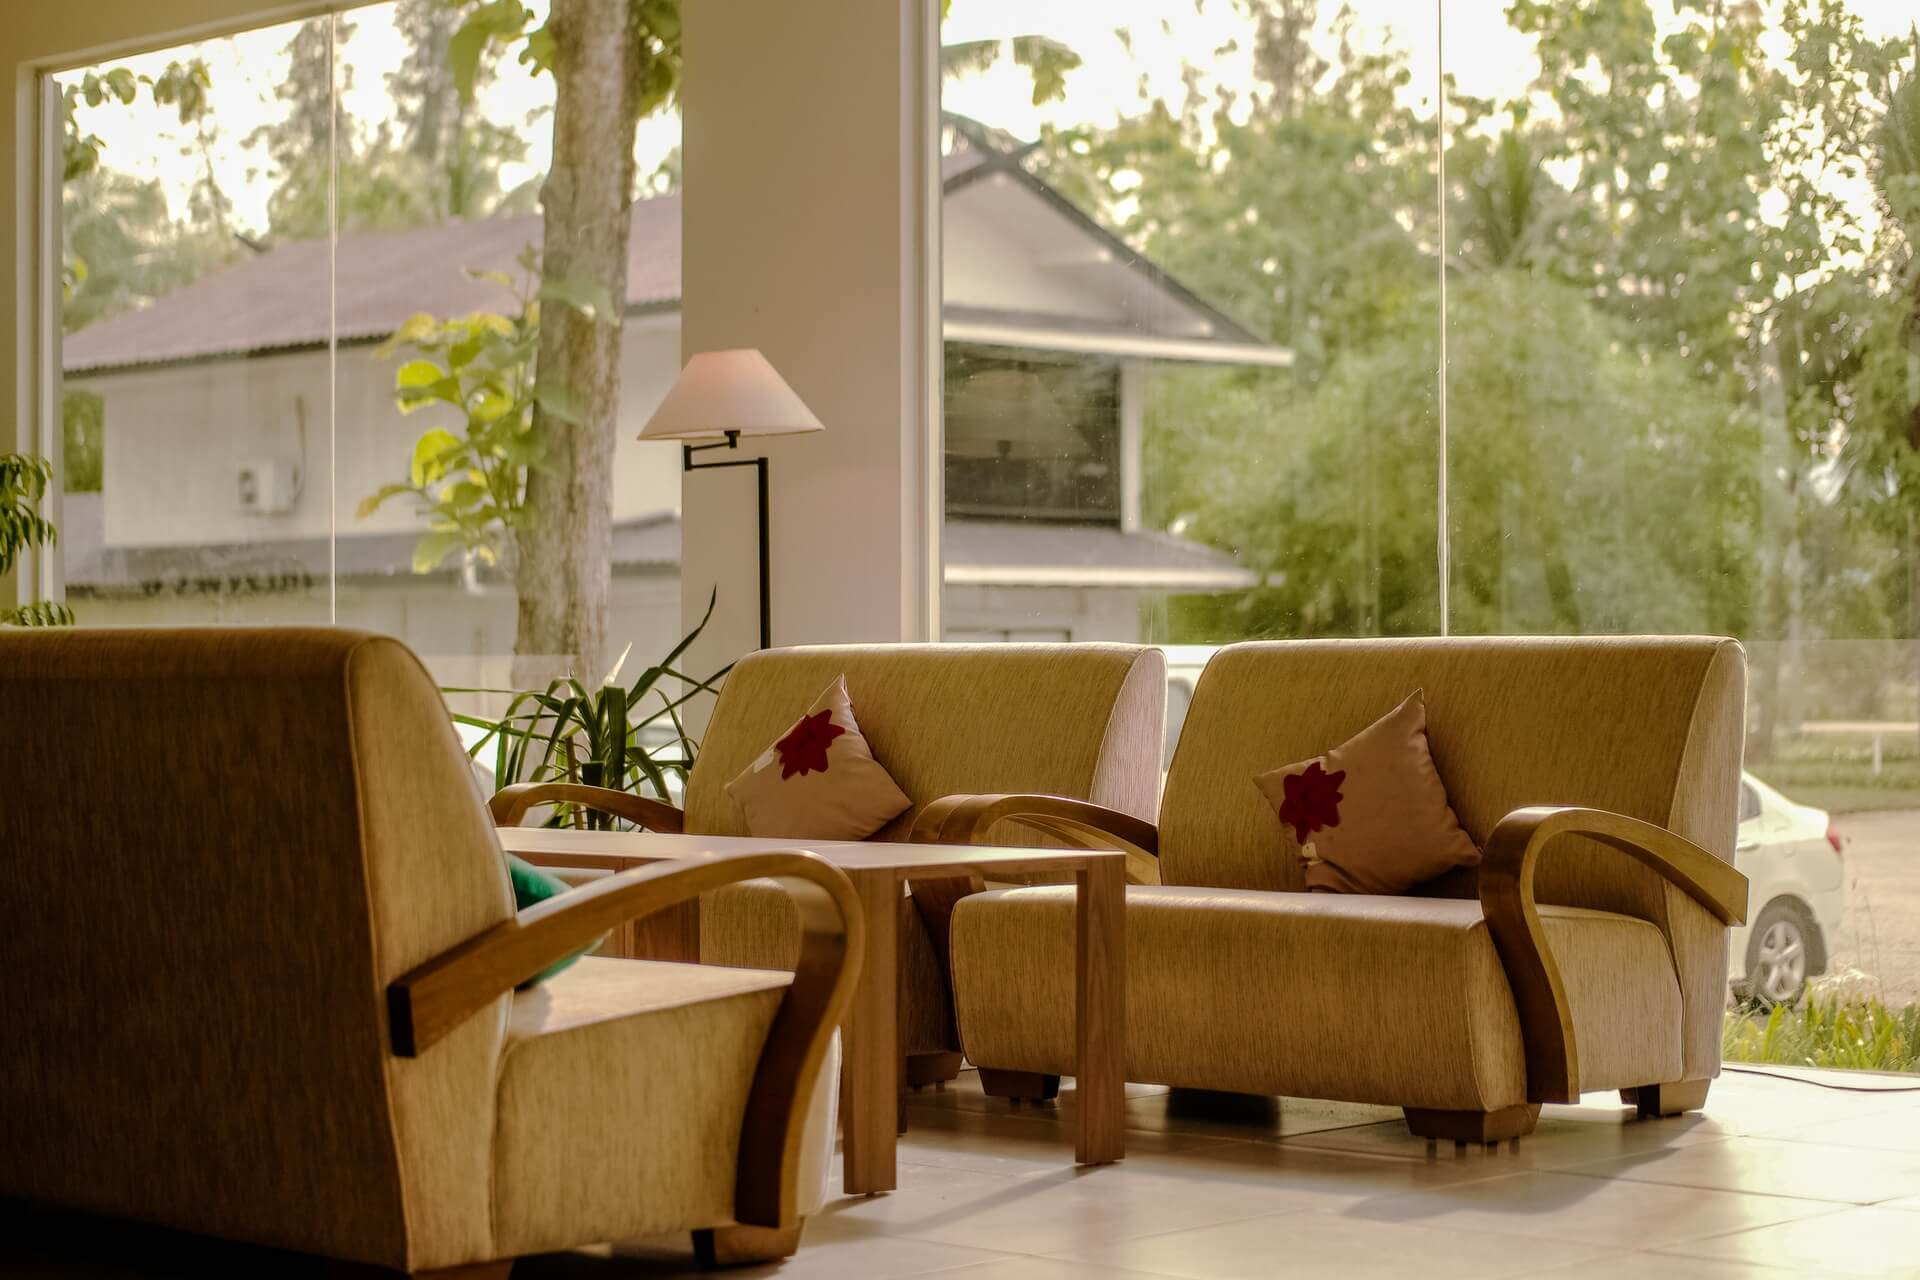 ohrensessel mit hocker kariert cheap with ohrensessel mit hocker kariert ohrensessel mit. Black Bedroom Furniture Sets. Home Design Ideas